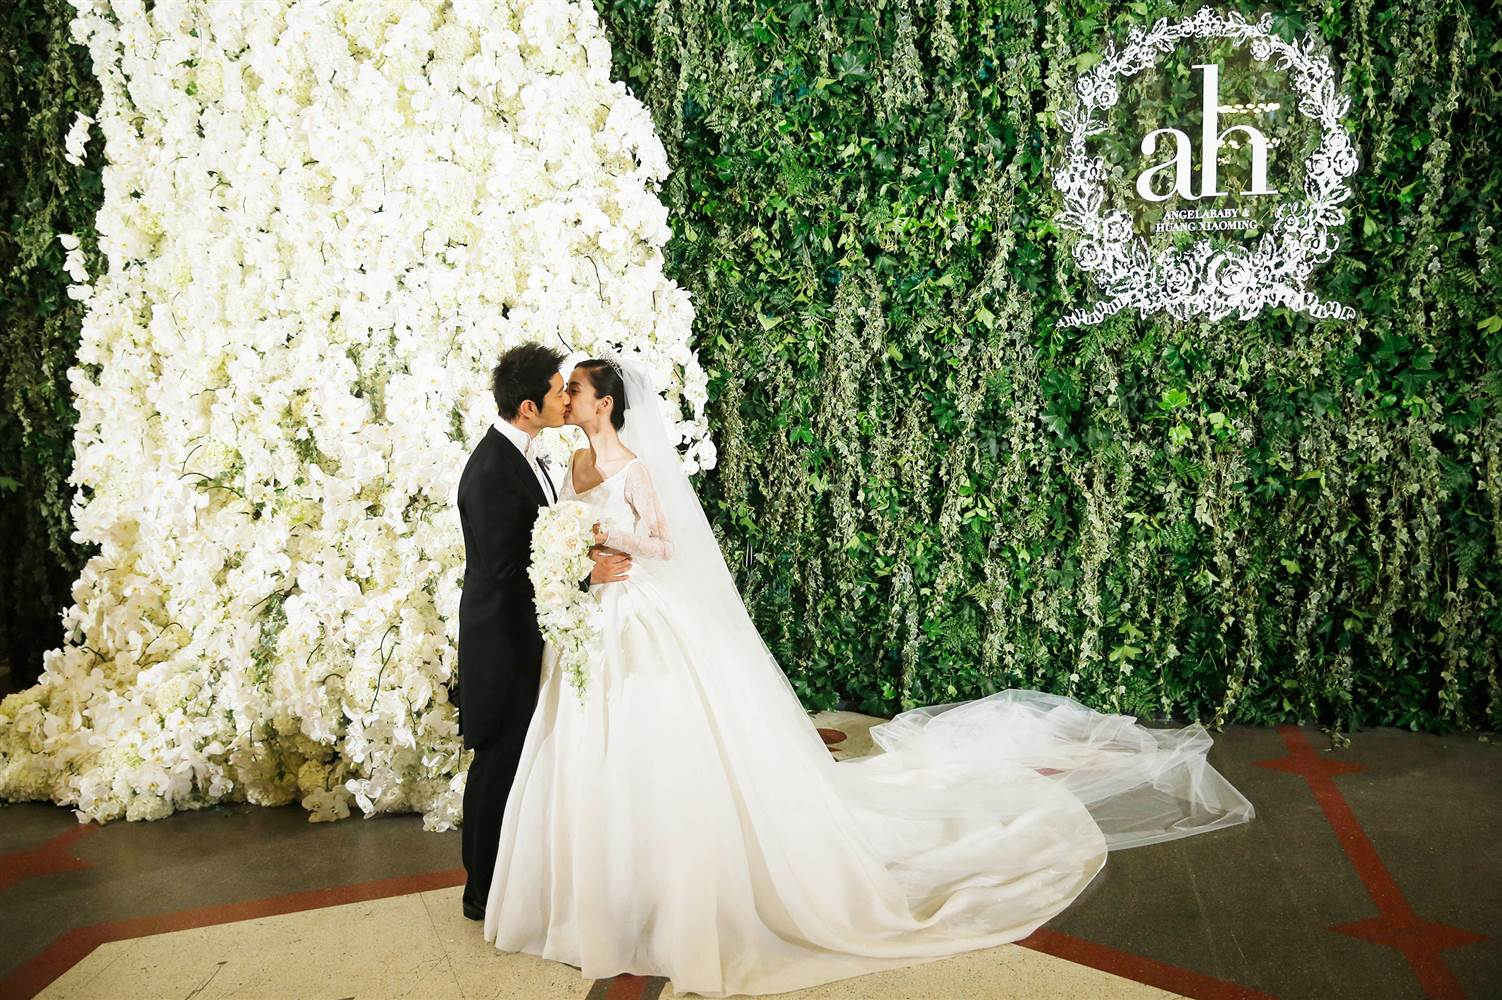 16 unique and beautiful wedding backdrop ideas